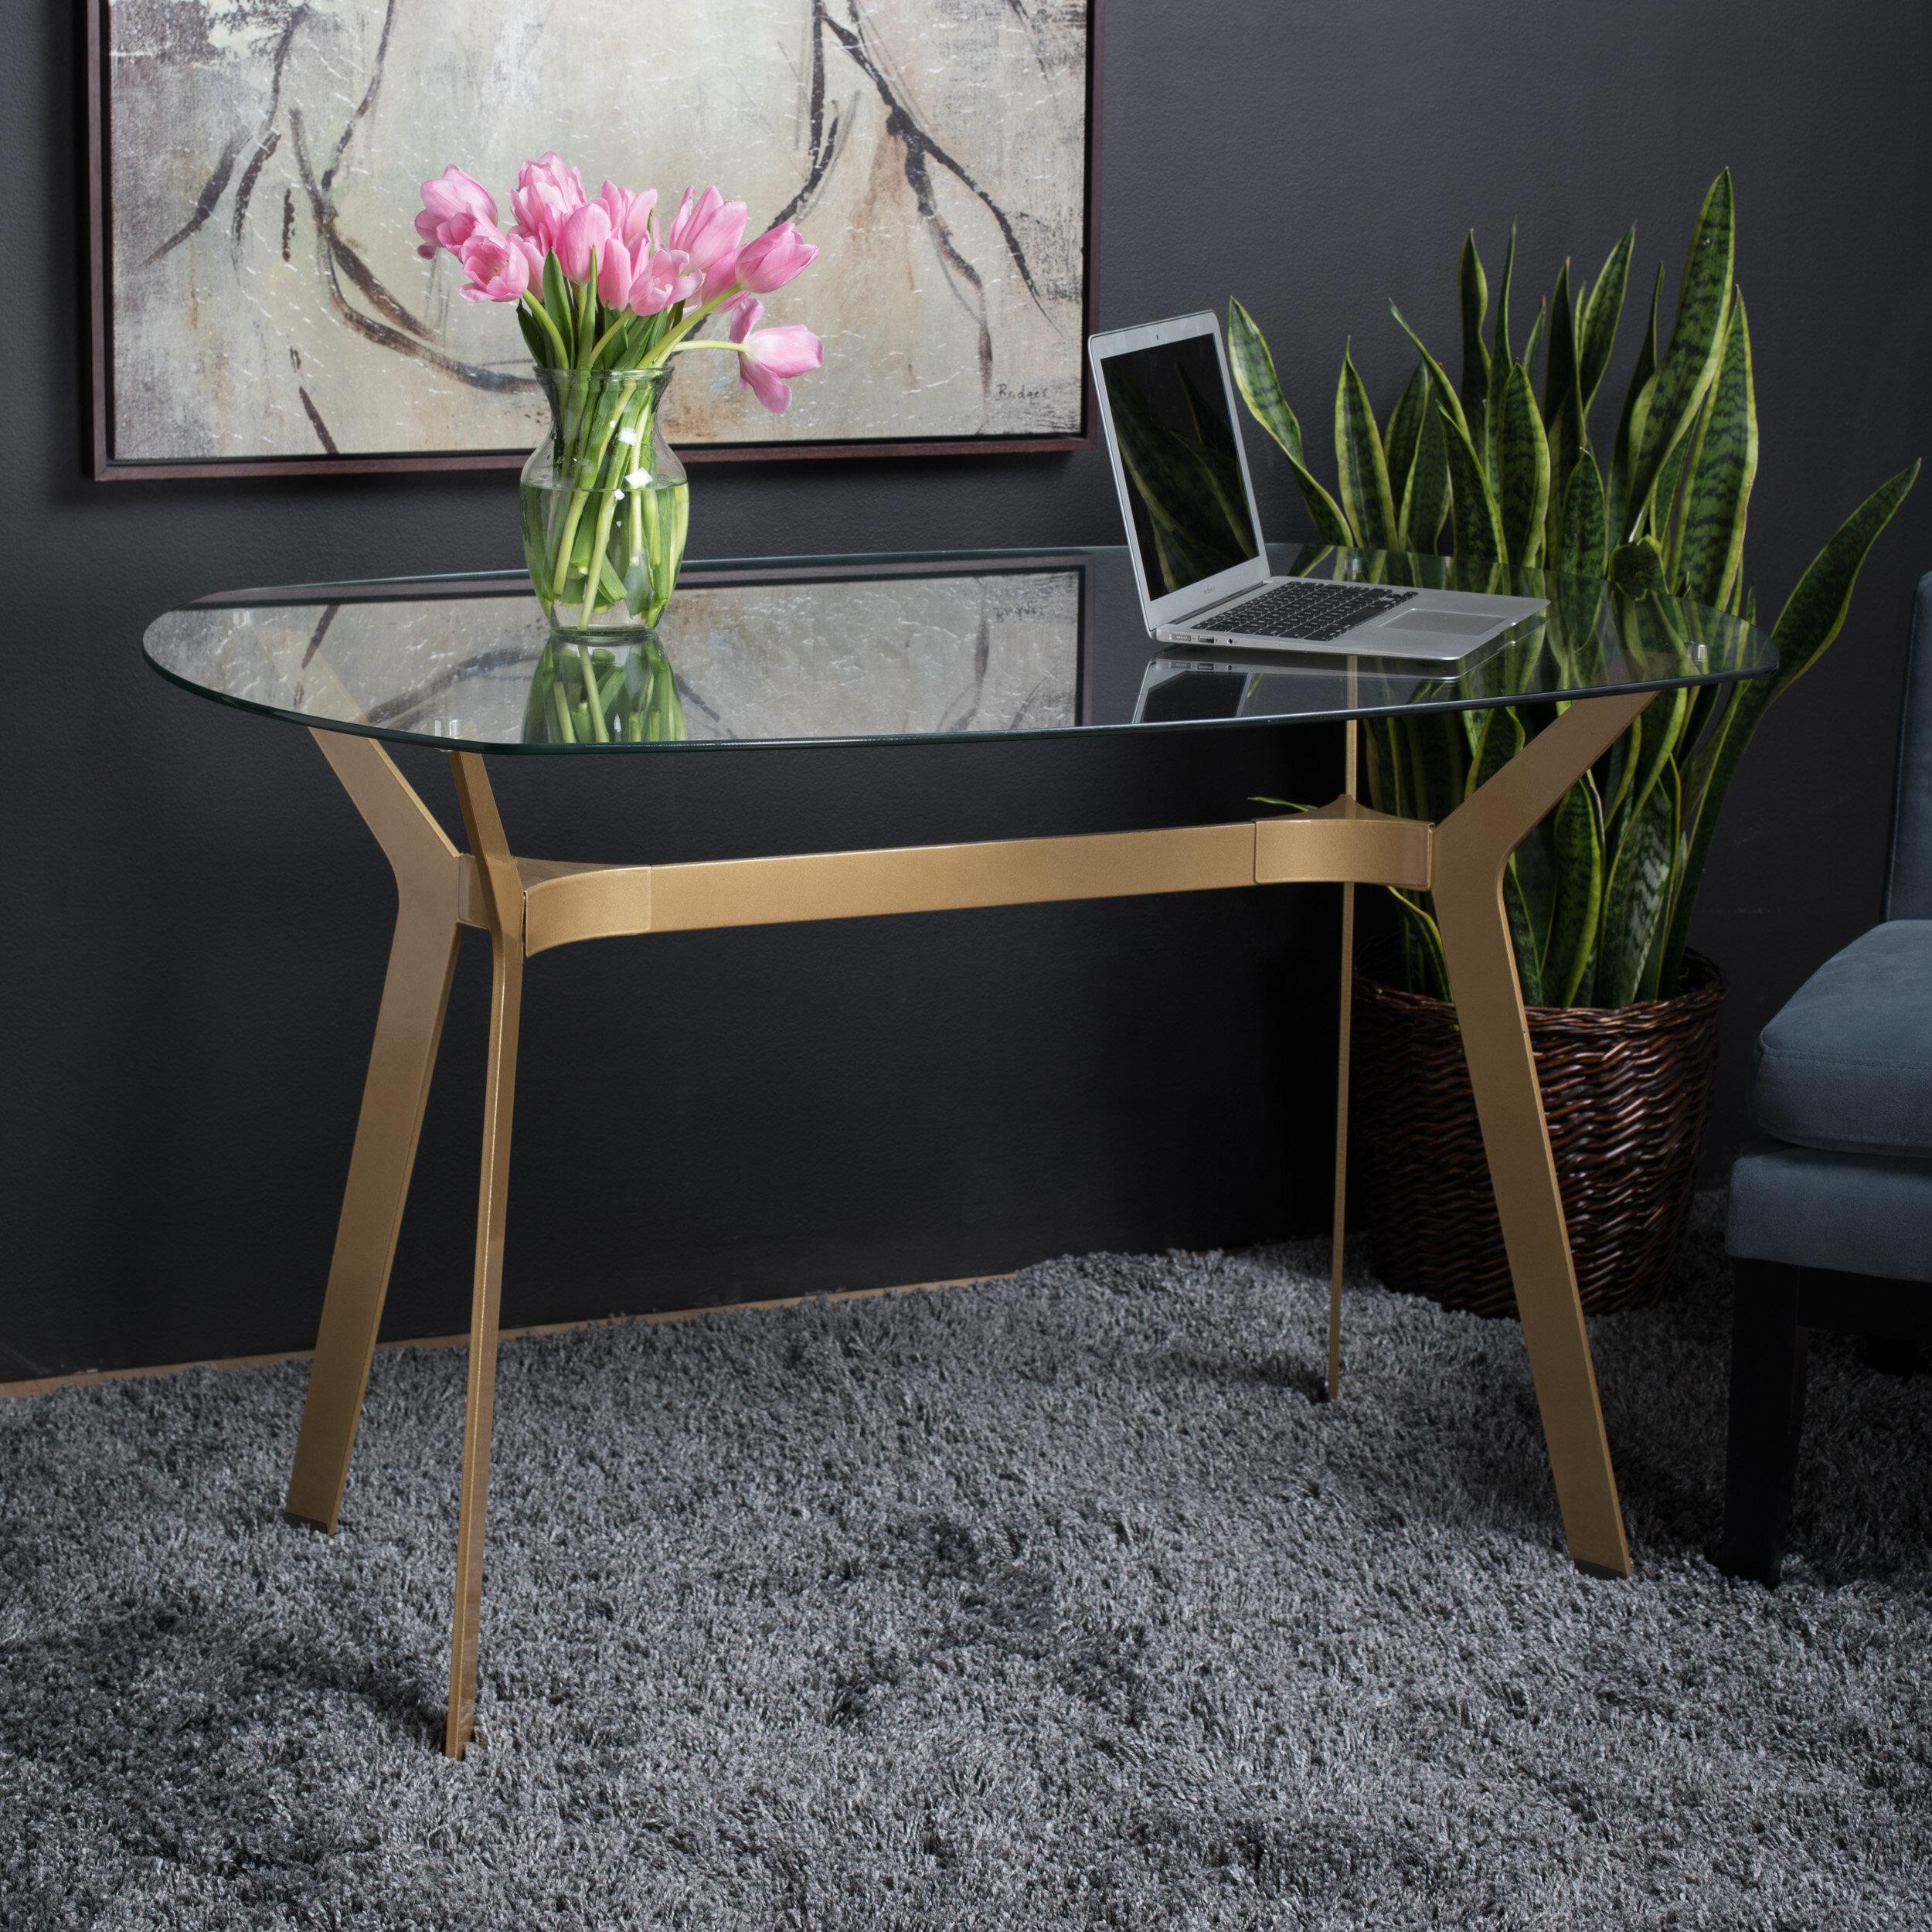 best furniture onsingularity thyge ikea glass com home desk modern office